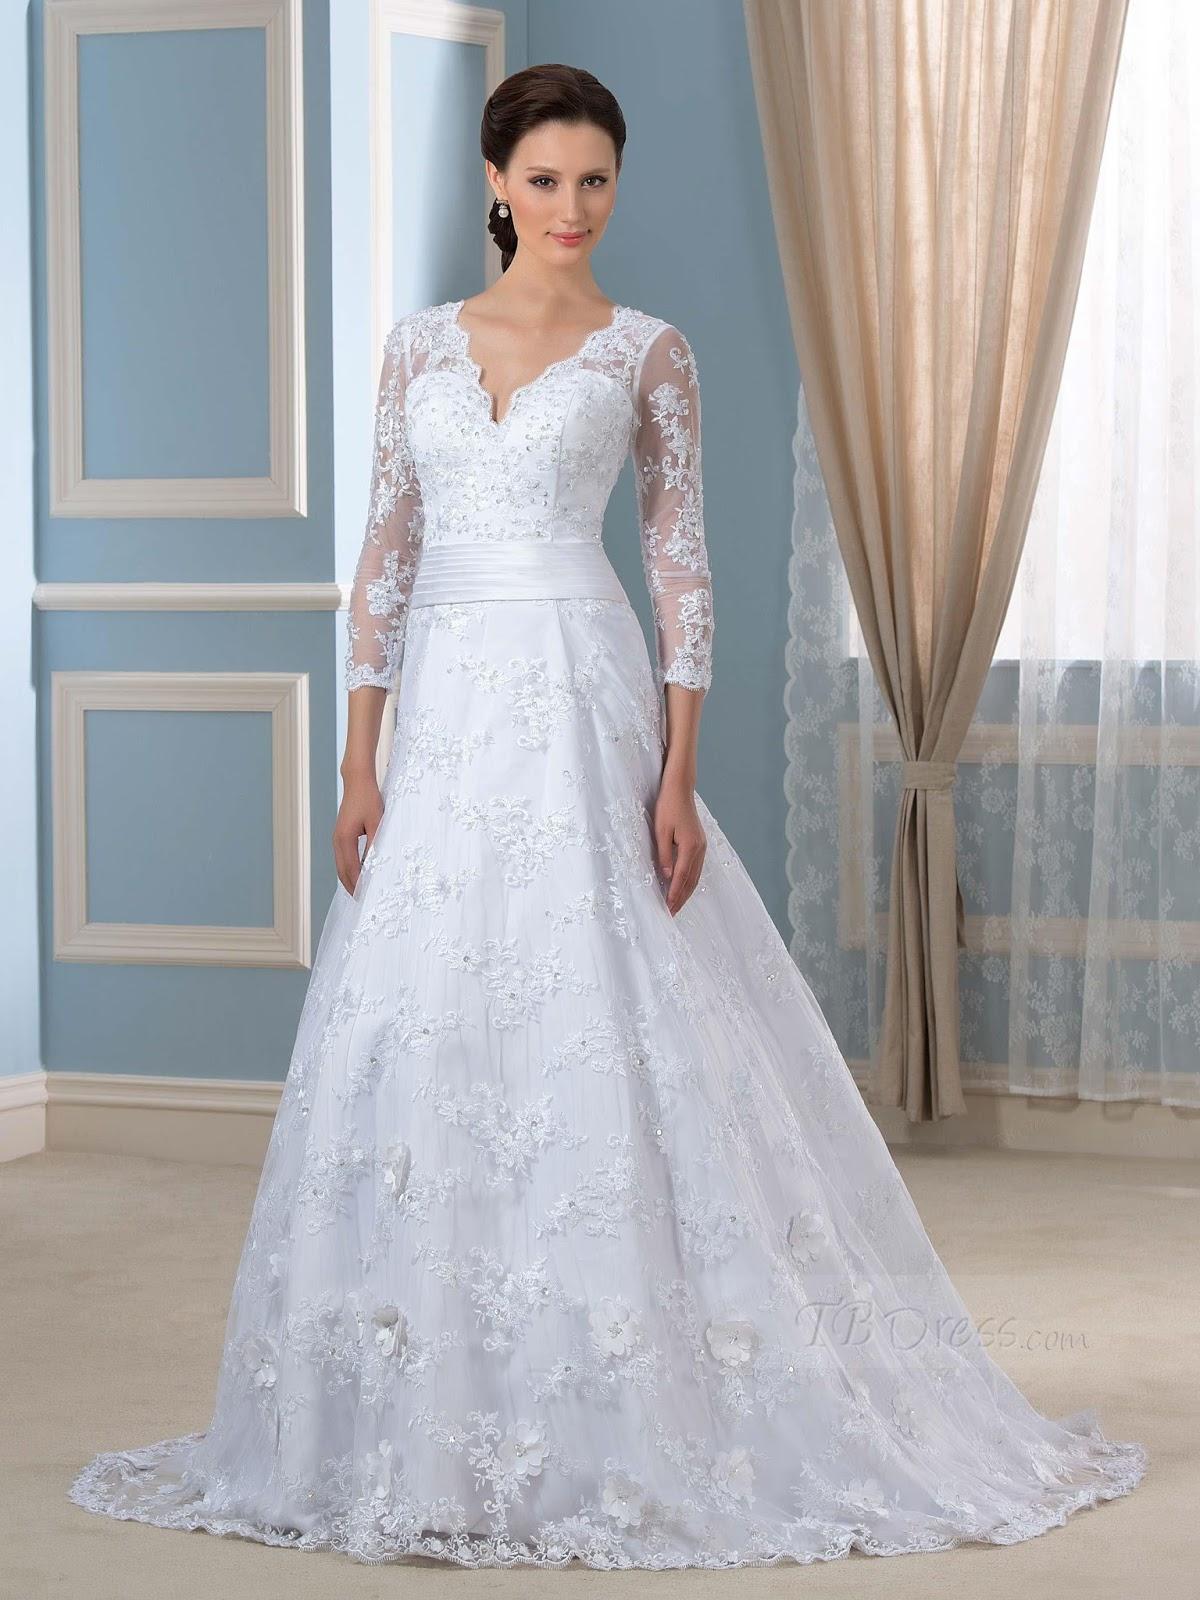 wedding dresses patterns free photo - 1